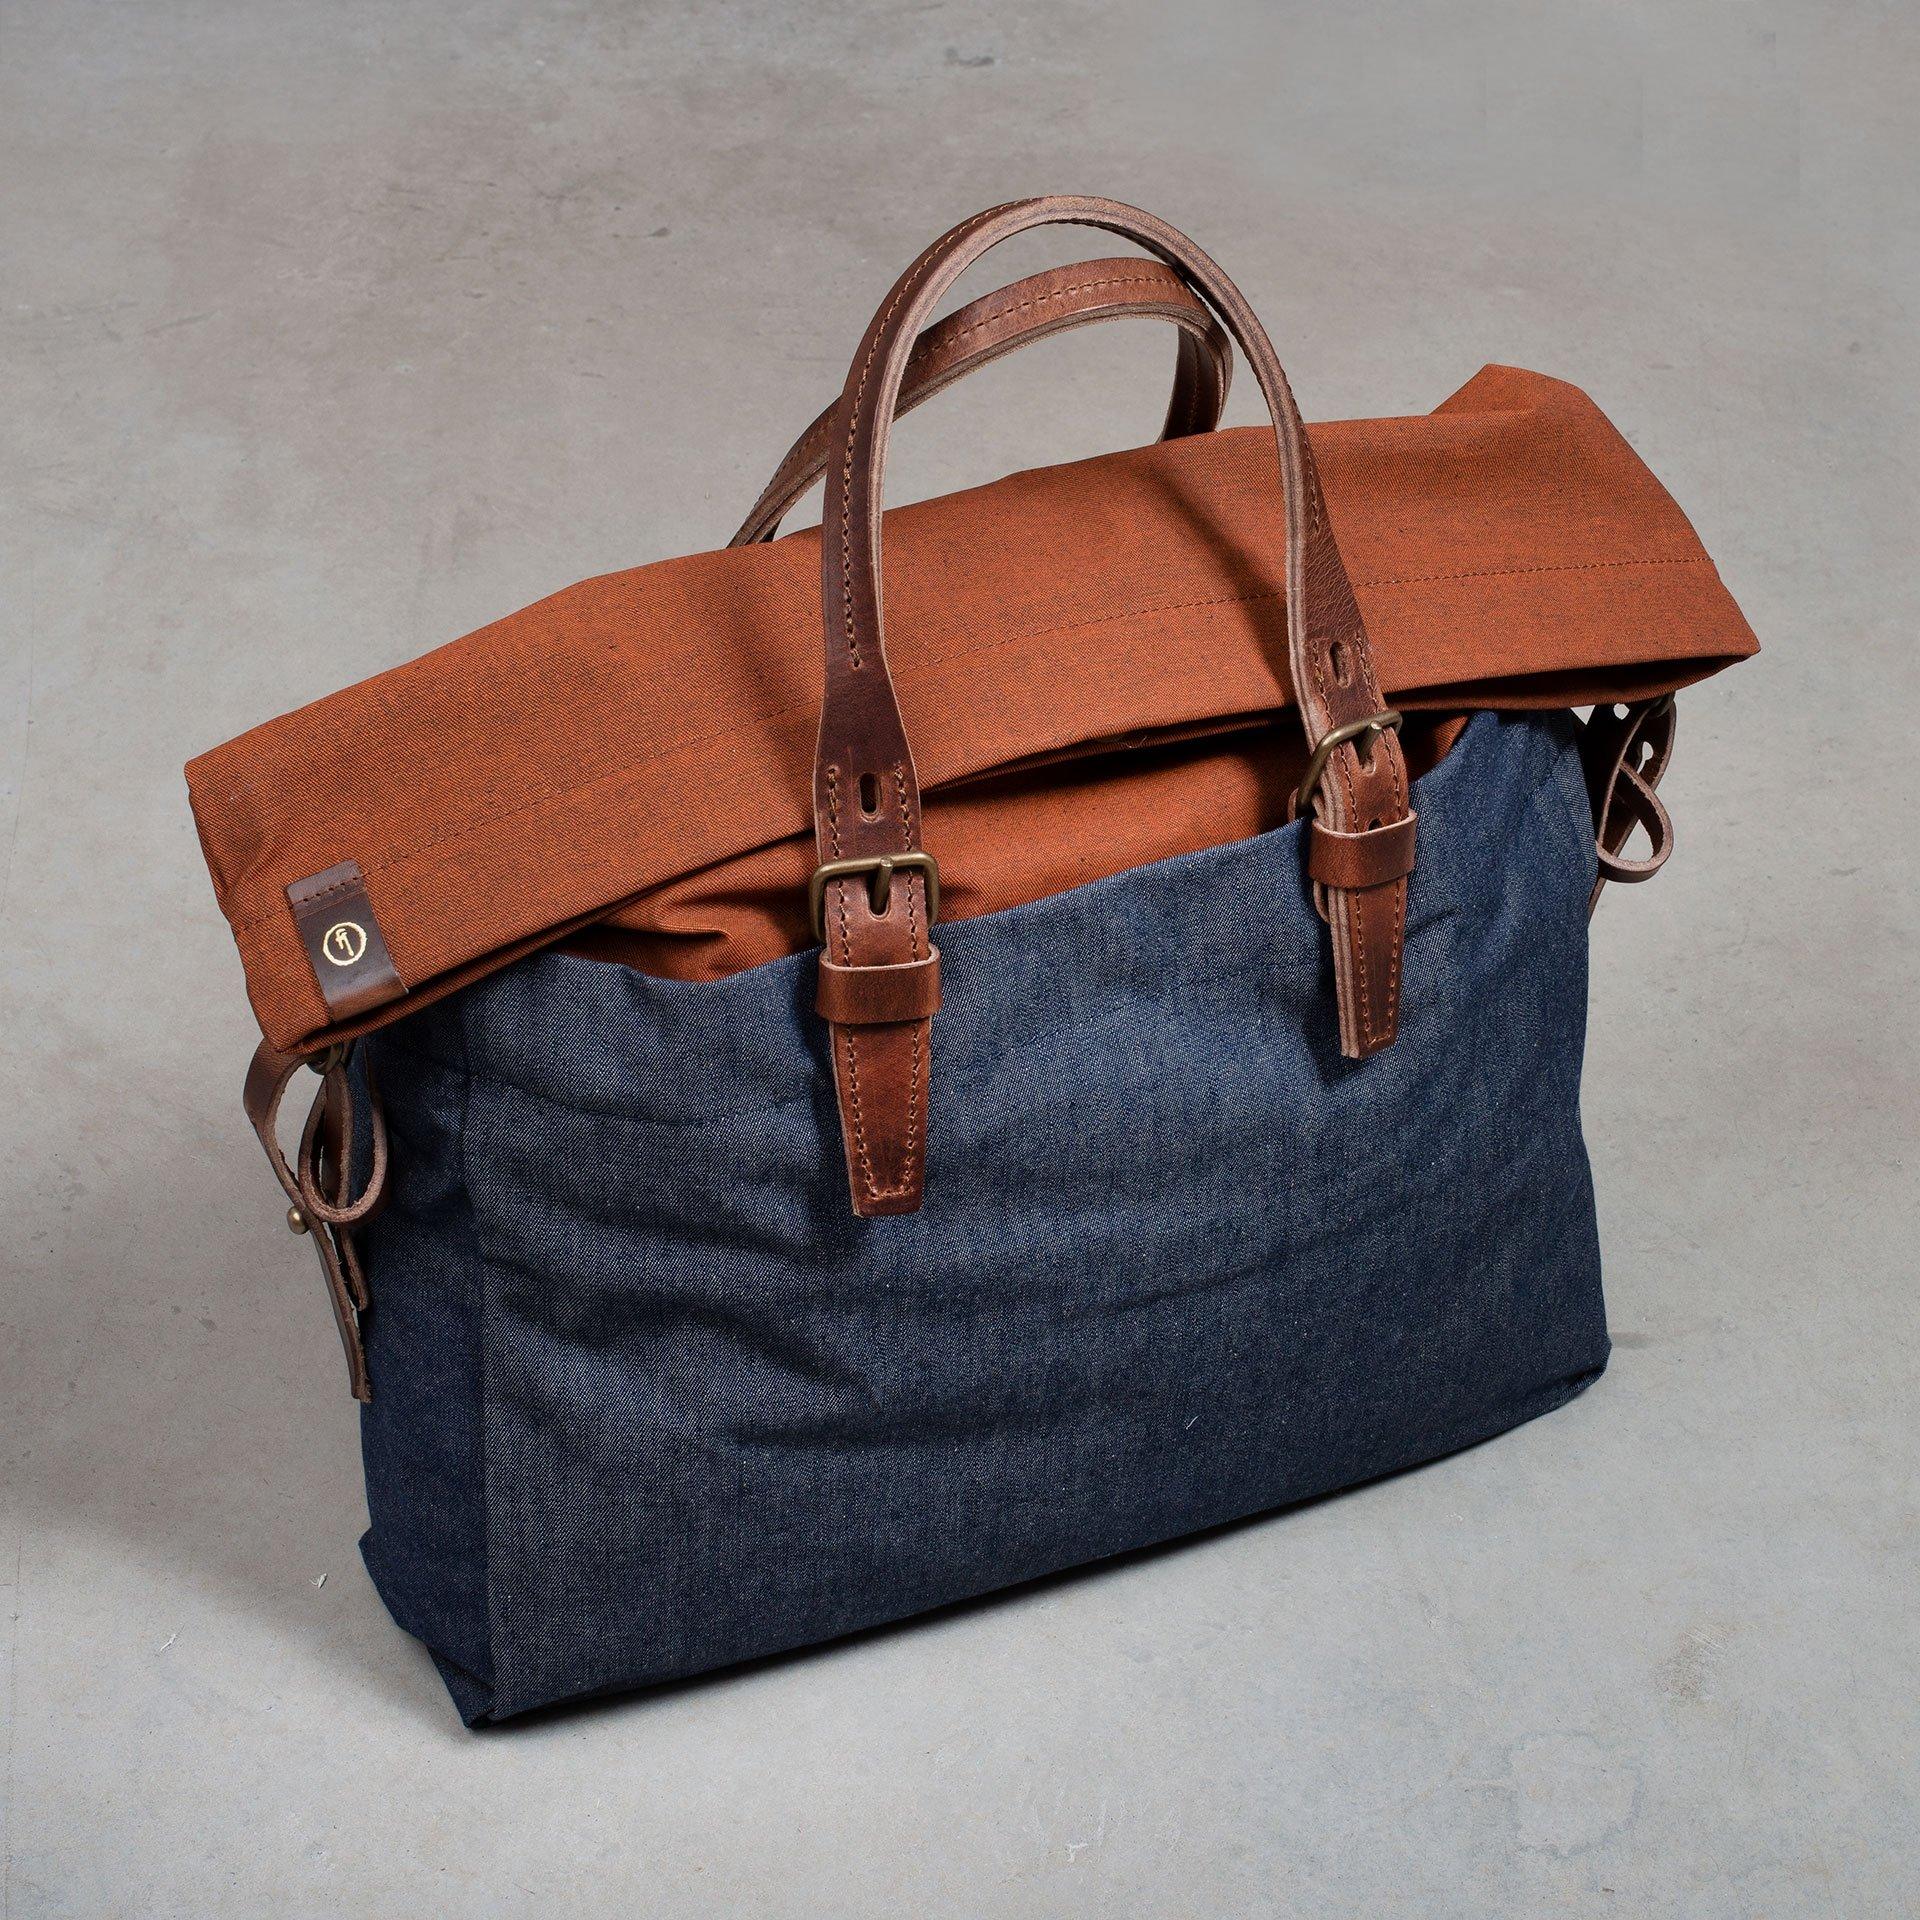 Remix business bag - Denim/Terra cotta (image n°5)